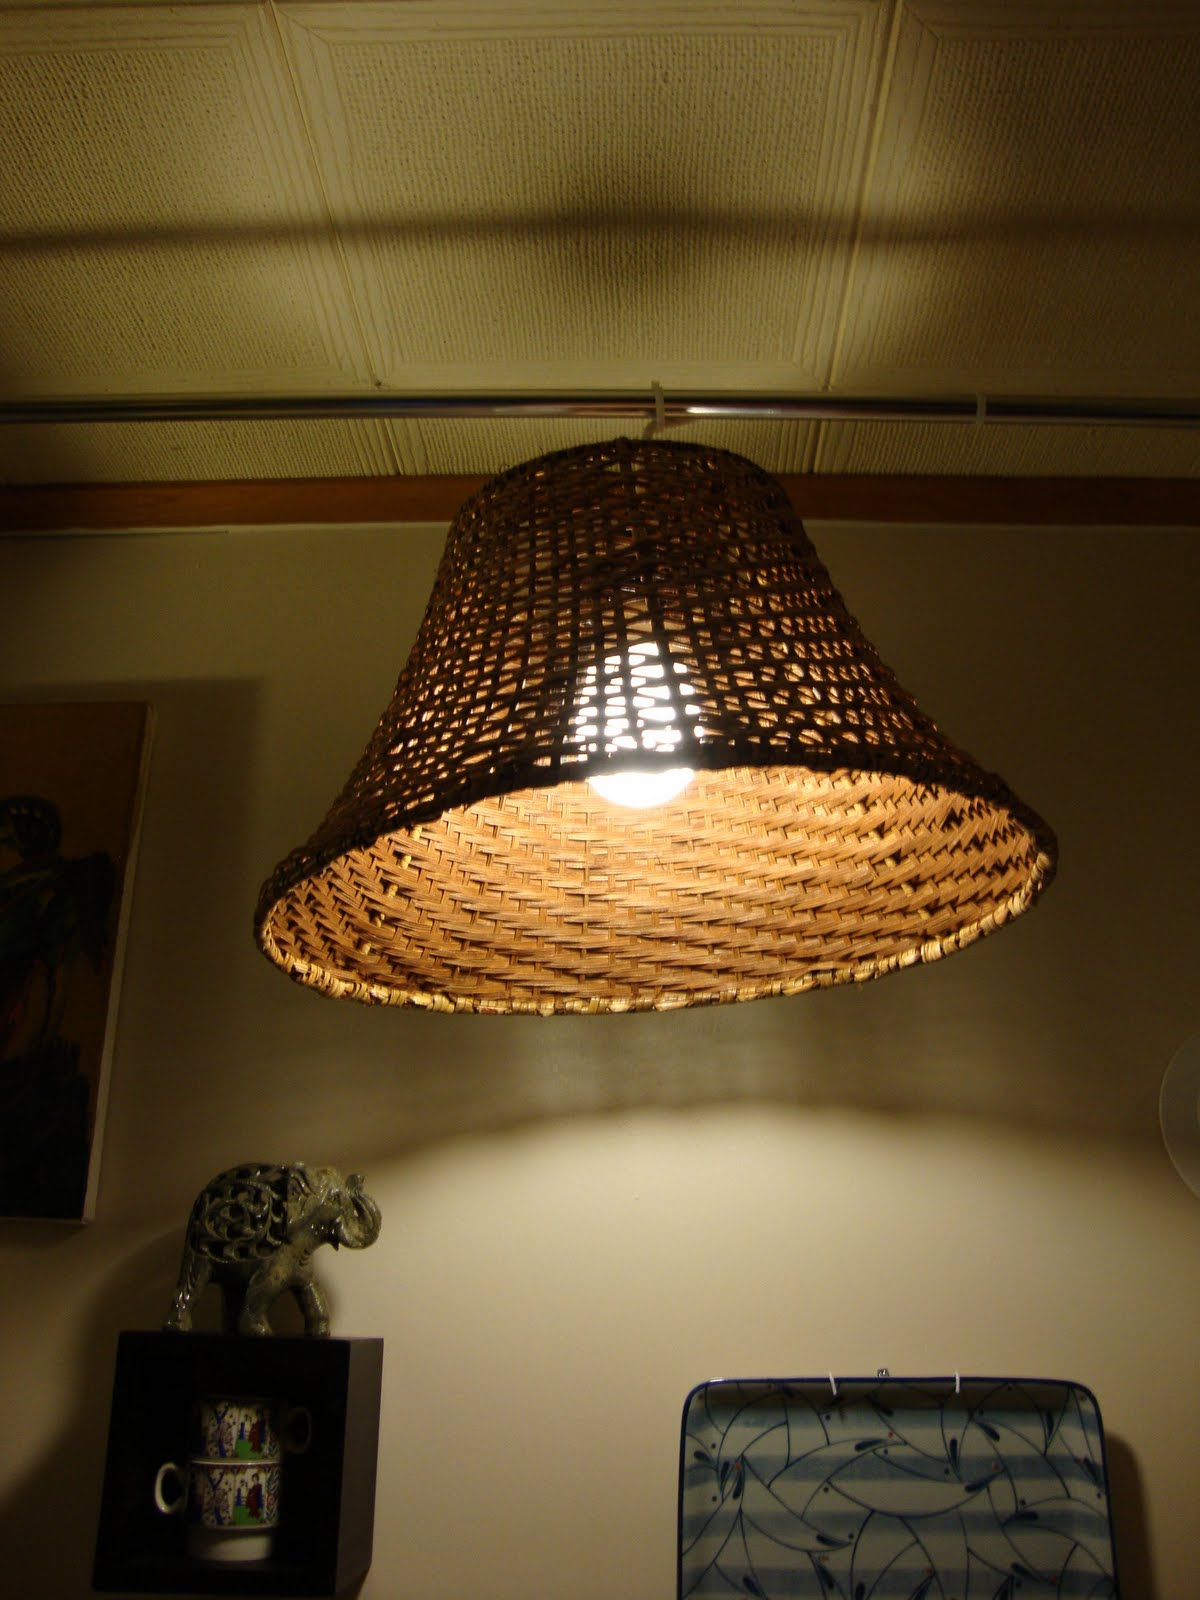 Tension Rod Hanging Lamp - IKEA Hackers